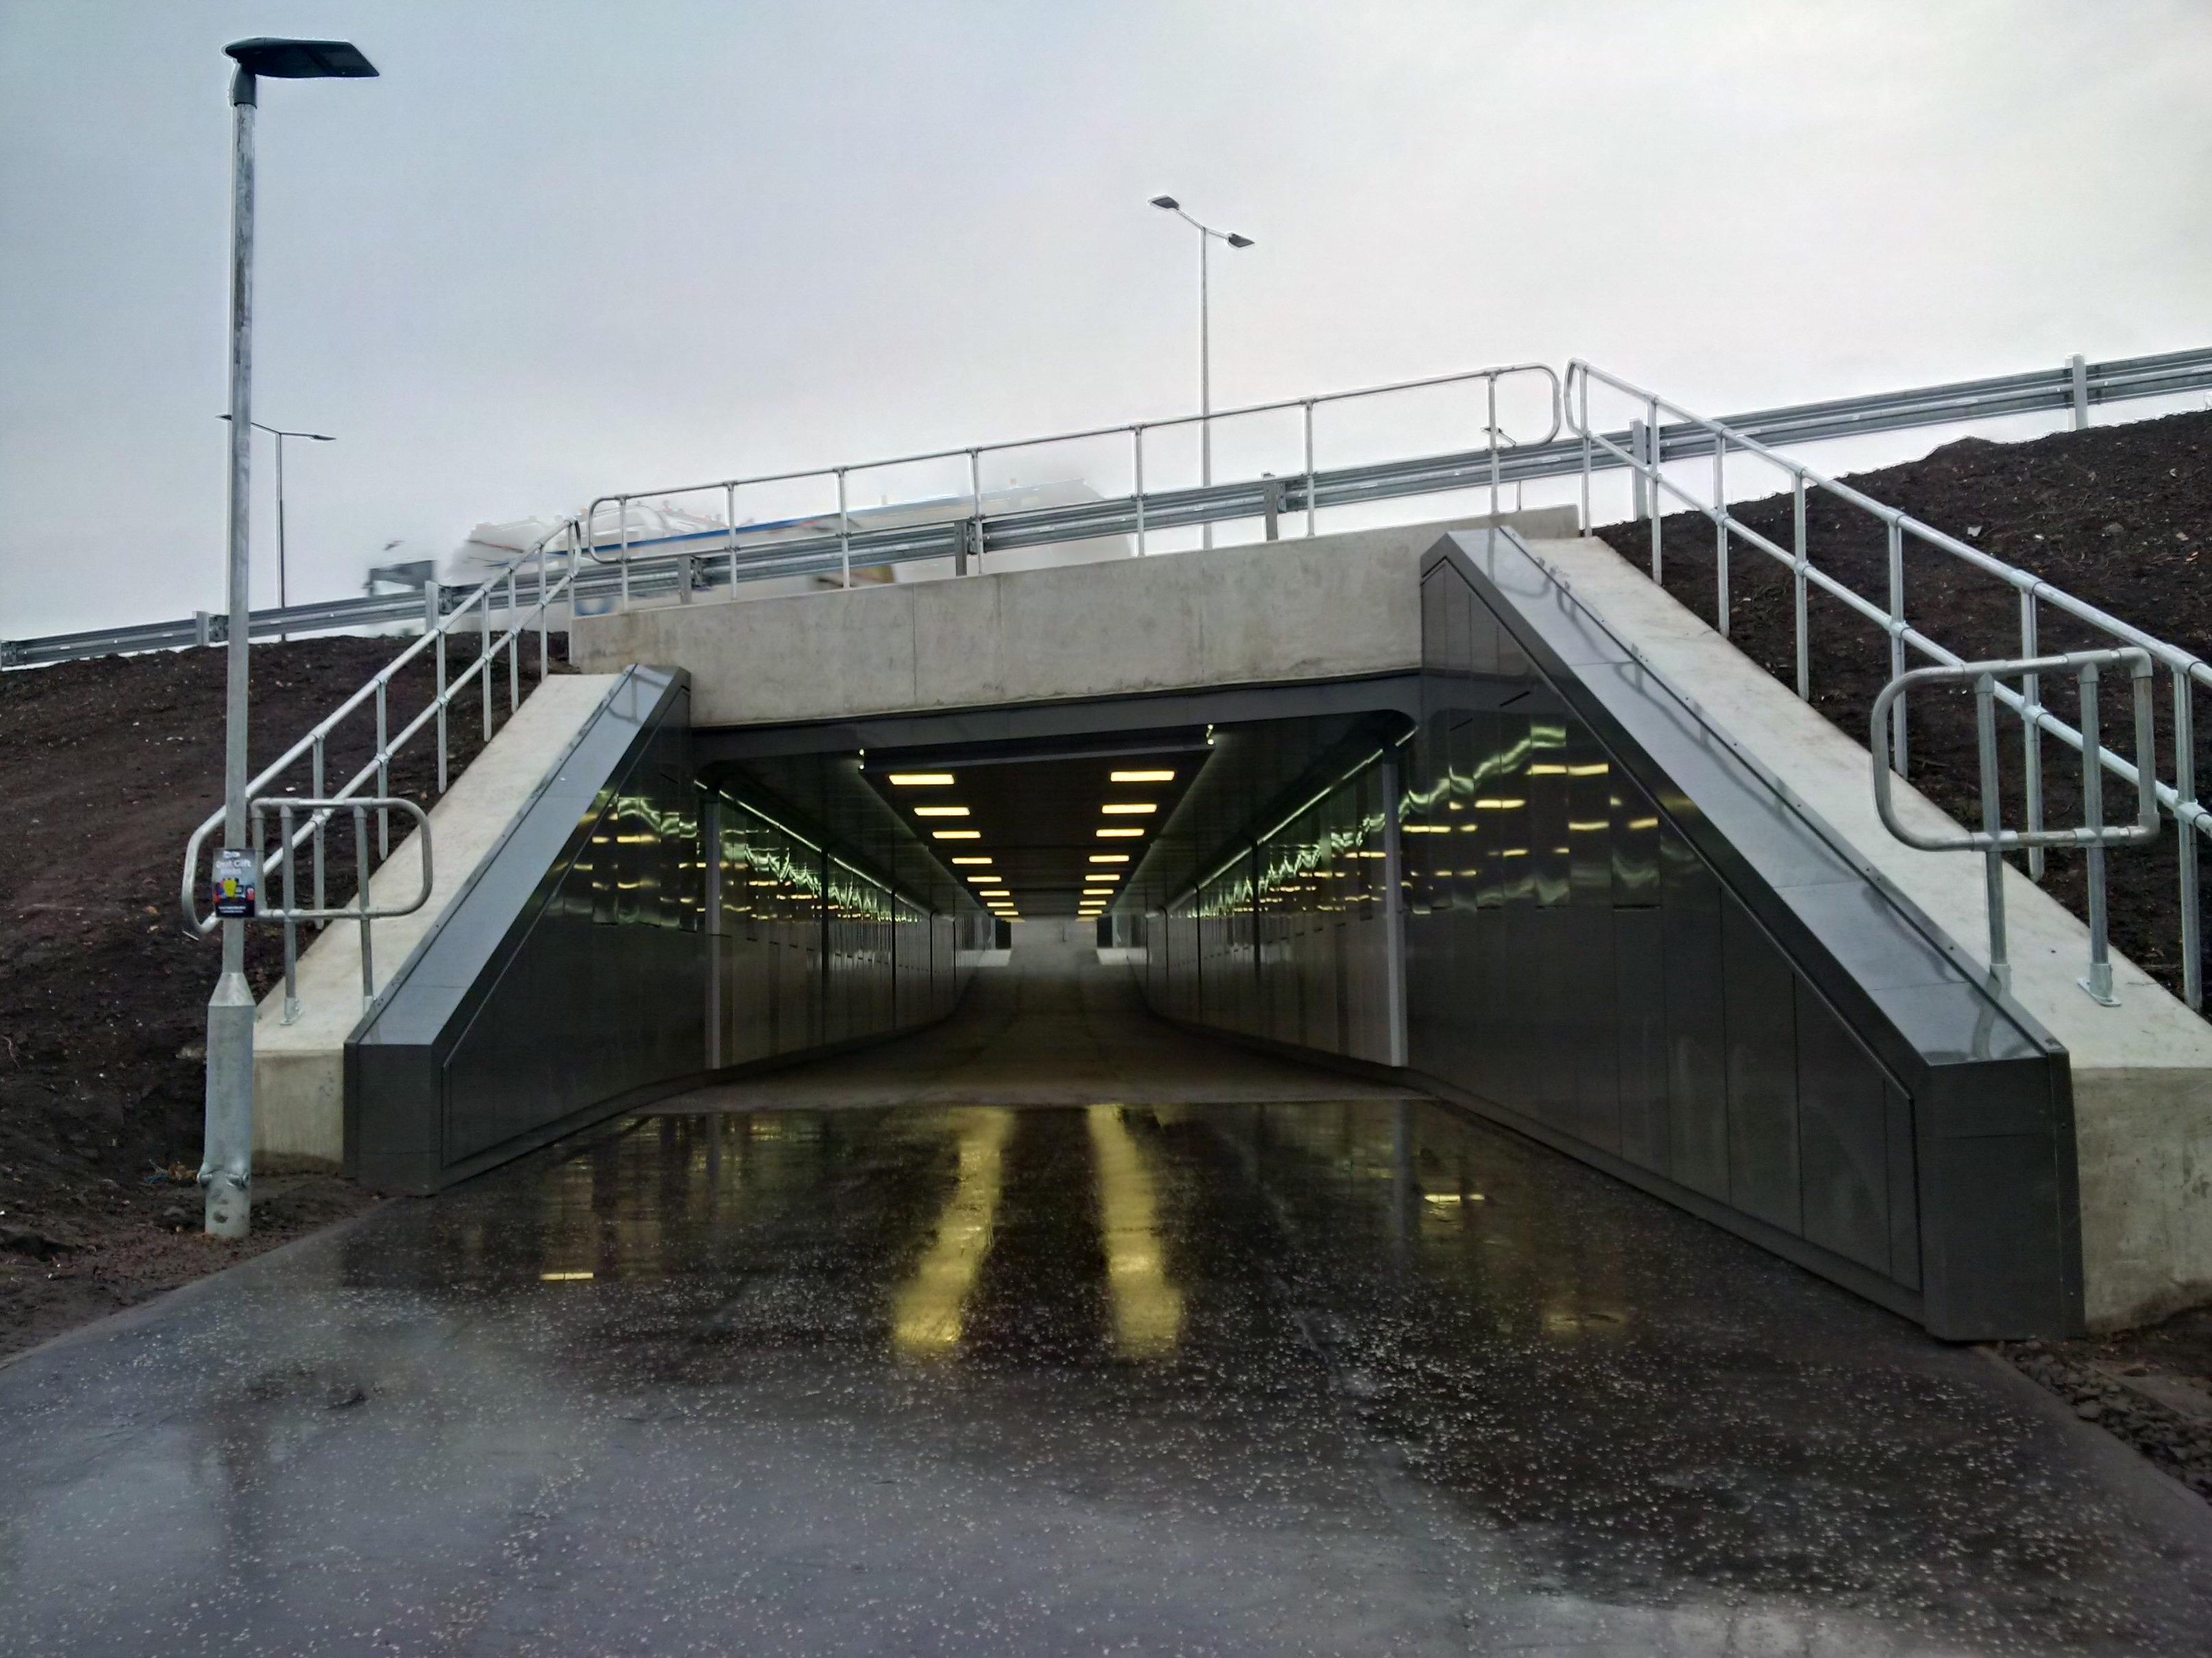 Edinburgh Trams handrails and Tube Clamps